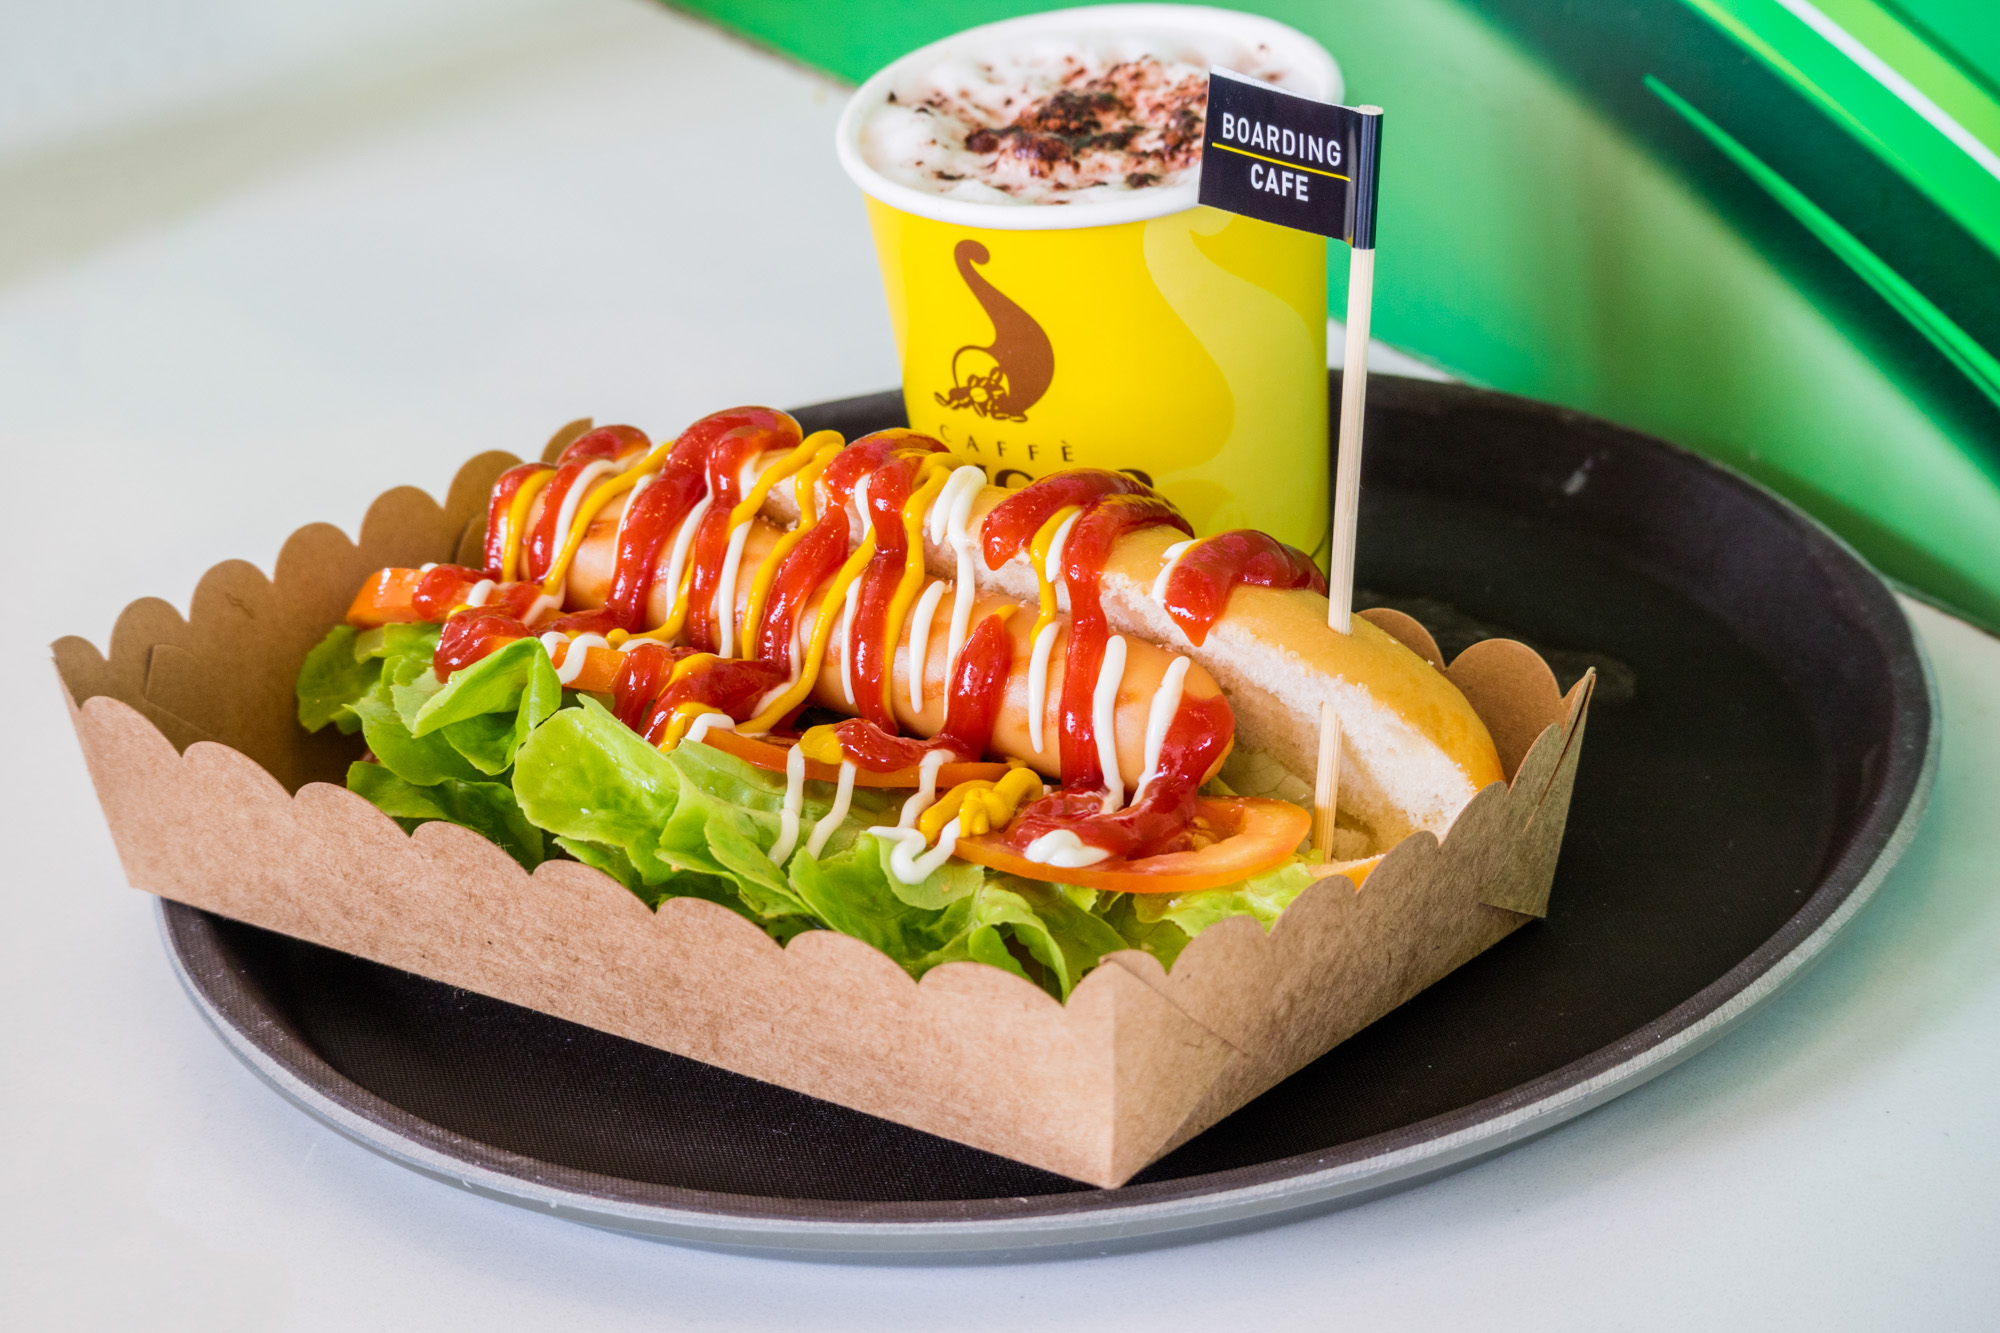 Bun Hotdog Boarding Café Phuket  ร้านอาหารแนะนำ ในอาคารผู้โดยสารขาออกระหว่างประเทศ ท่าอากาศยานภูเก็ต IMG 8198